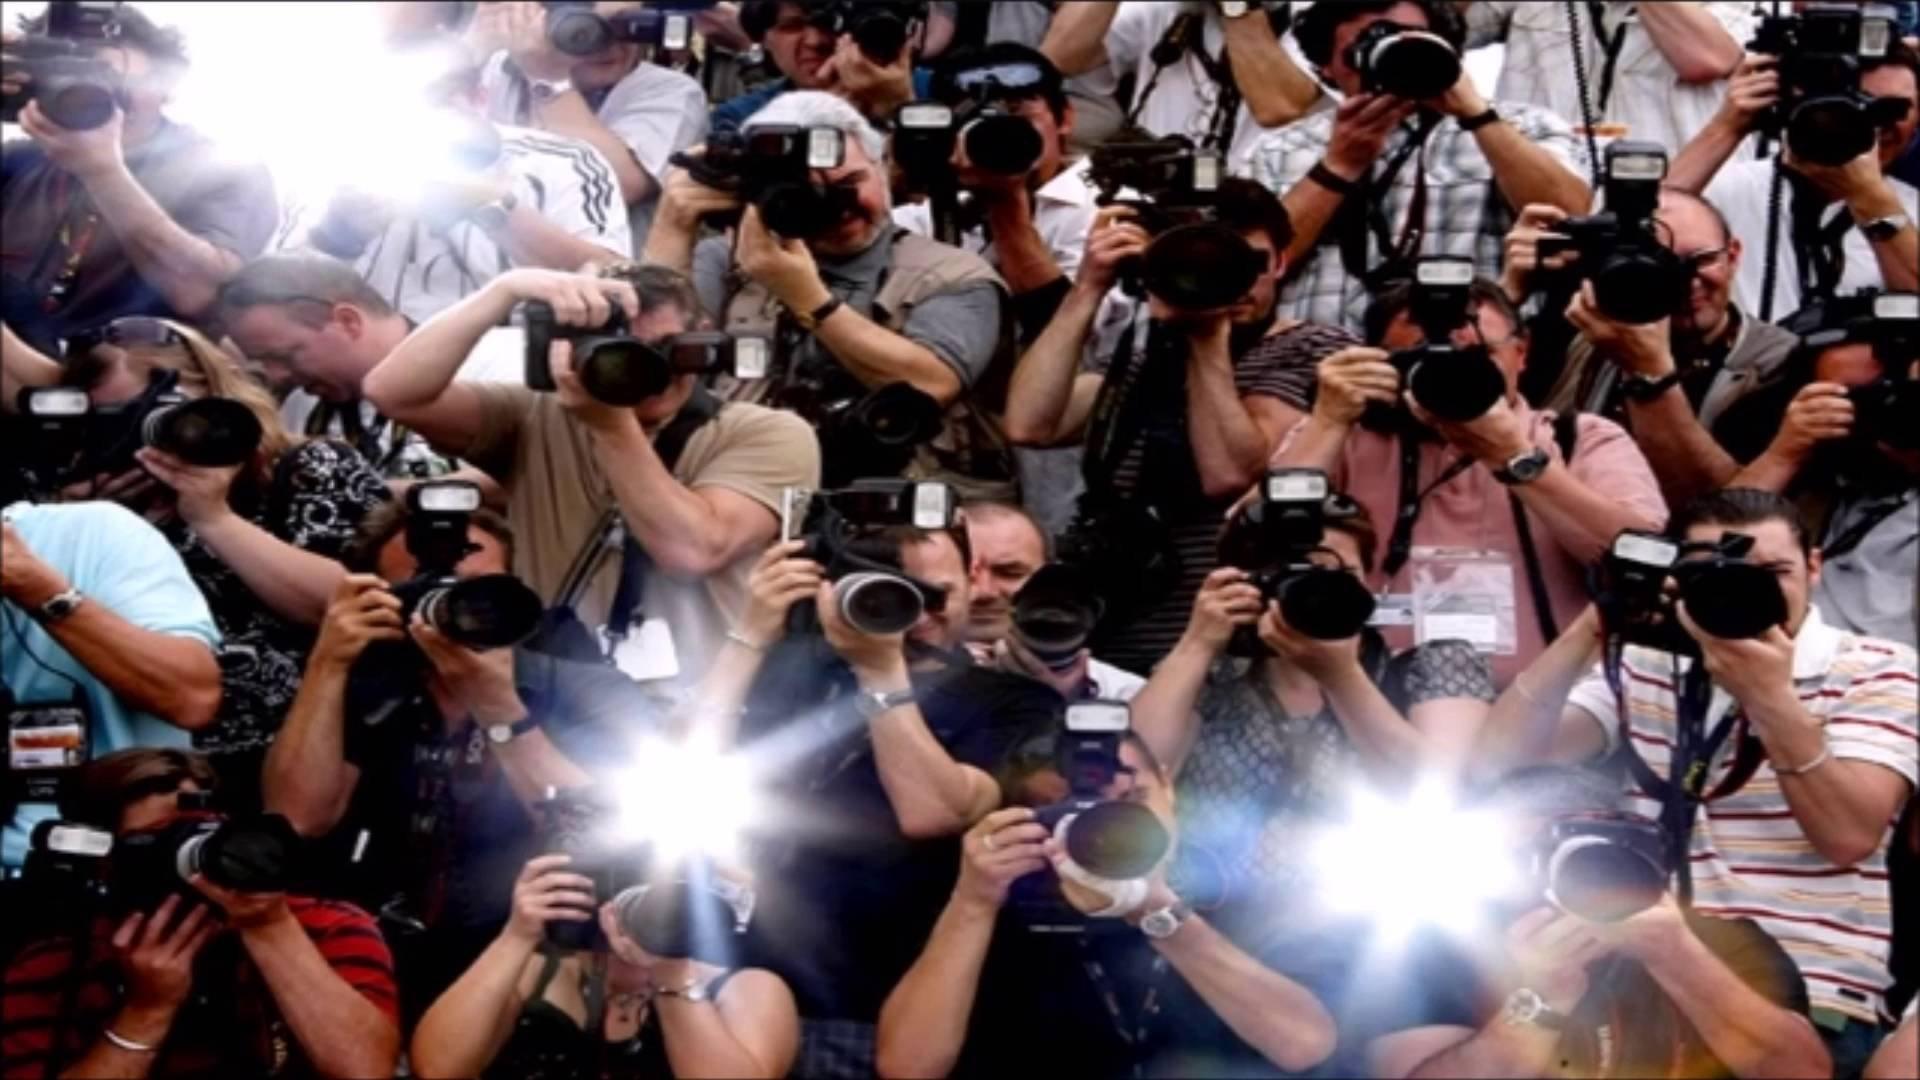 img 5a52686bd69d8.png?resize=1200,630 - 芸能人のプライベート写真の流出はなぜ起こる?